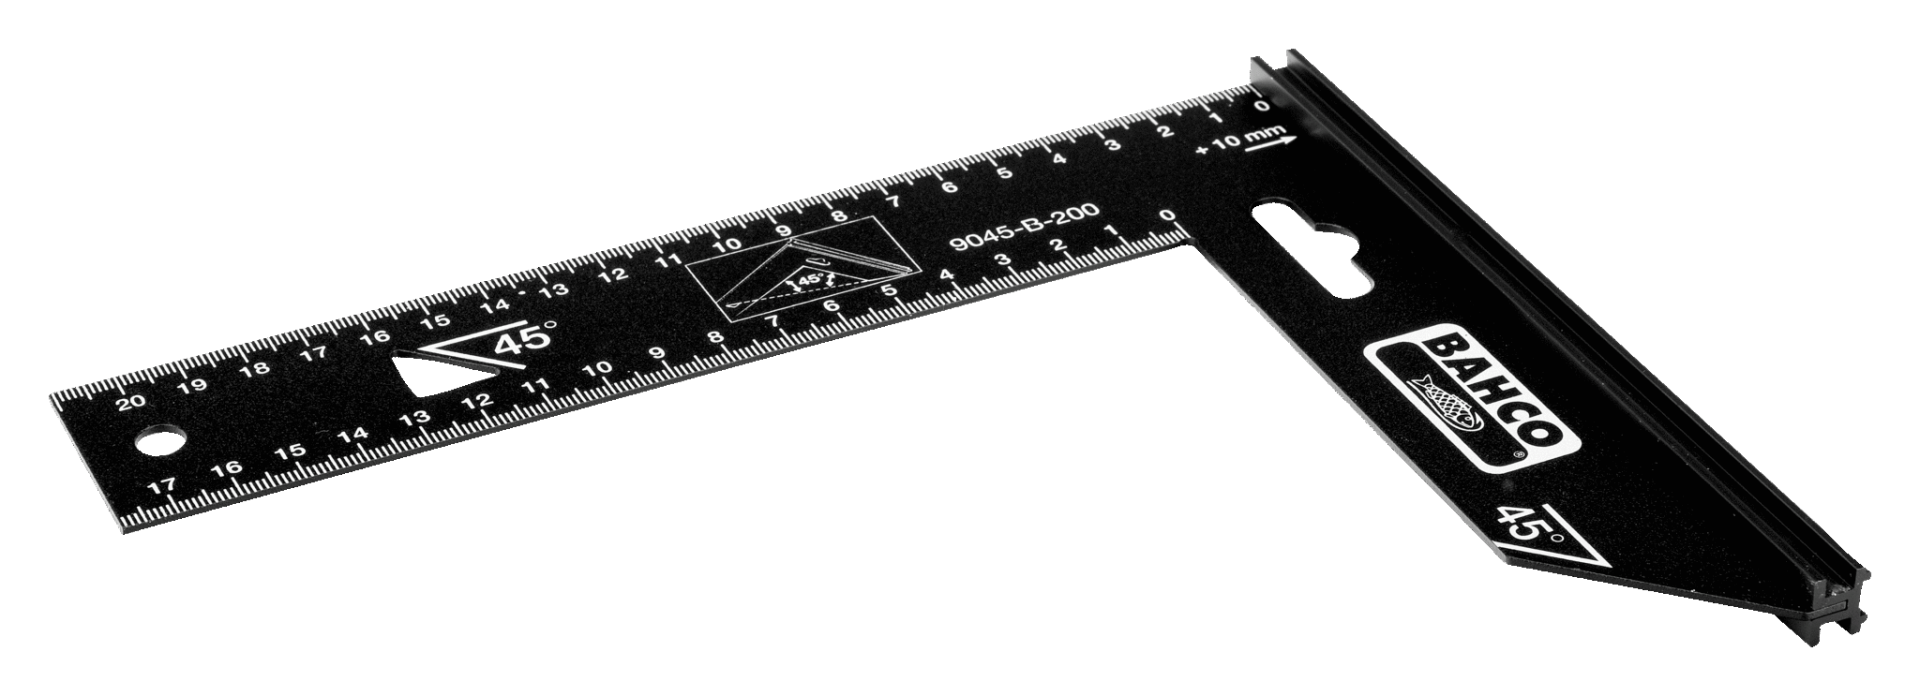 Kątownik 250 x 170 mm 90 i 45 stopni BAHCO (nr kat. 9045-B-250)